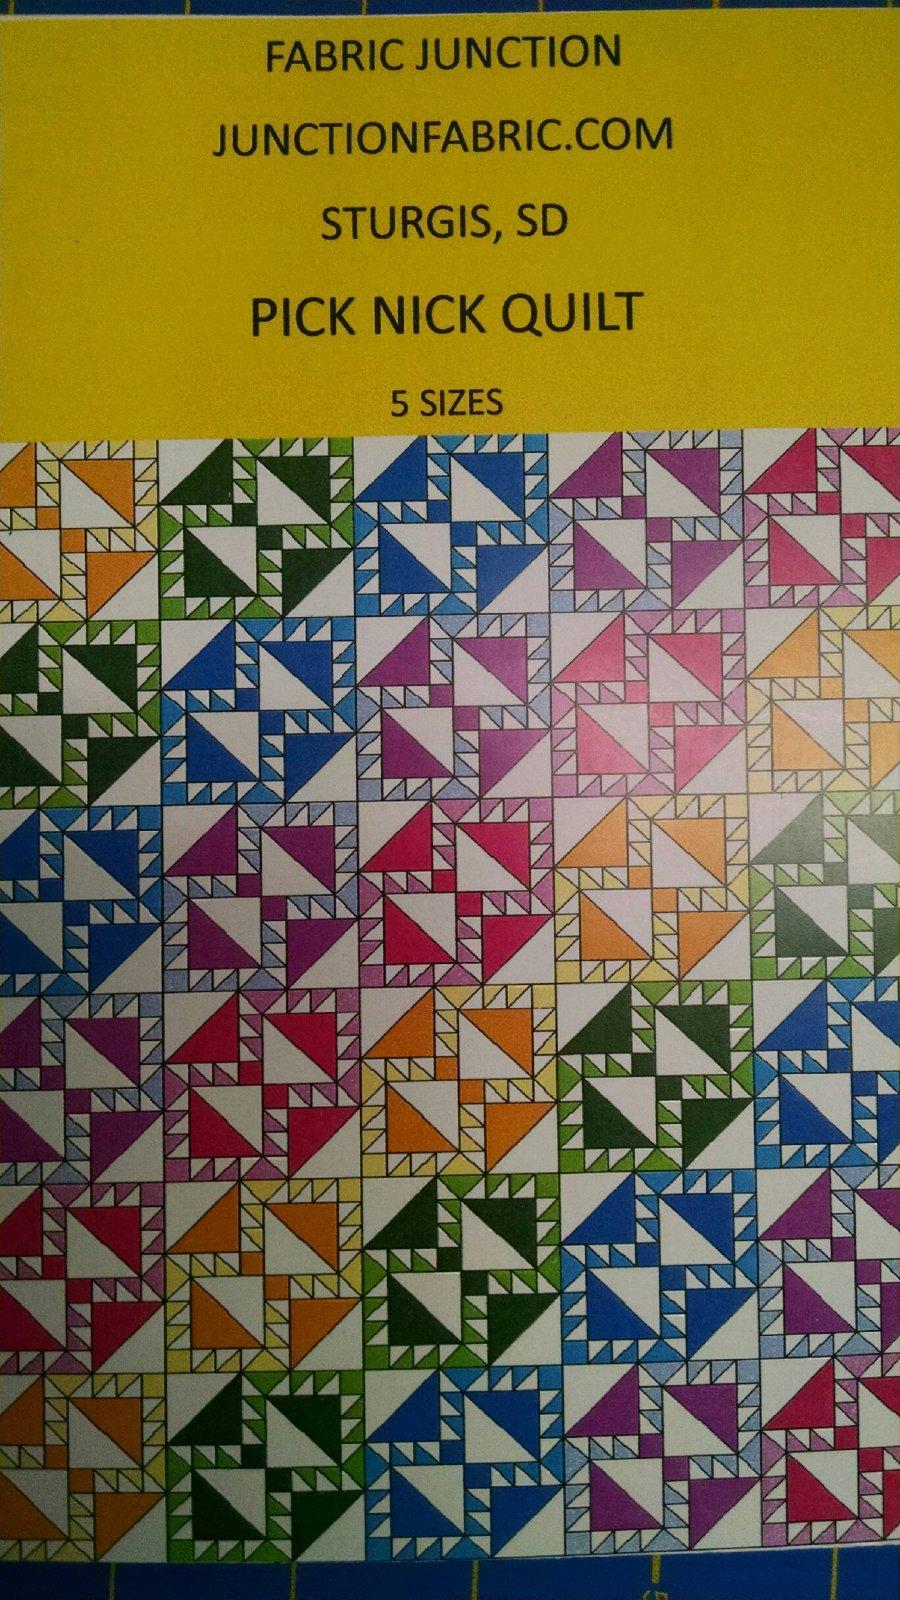 Pick Nick Quilt pattern